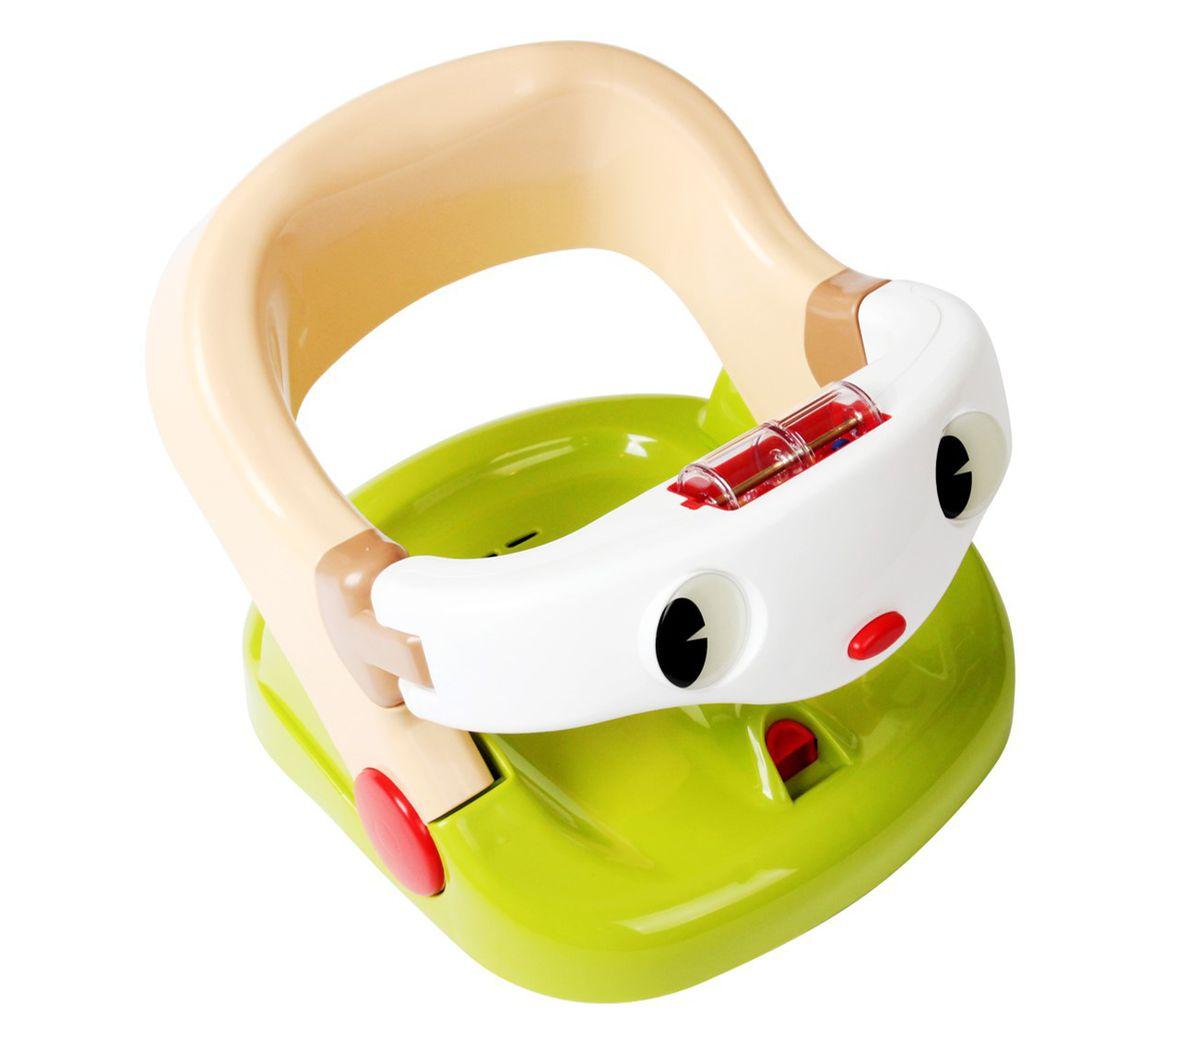 Baby bath chair safety 1st - Safety 1st Baby Bath Seat